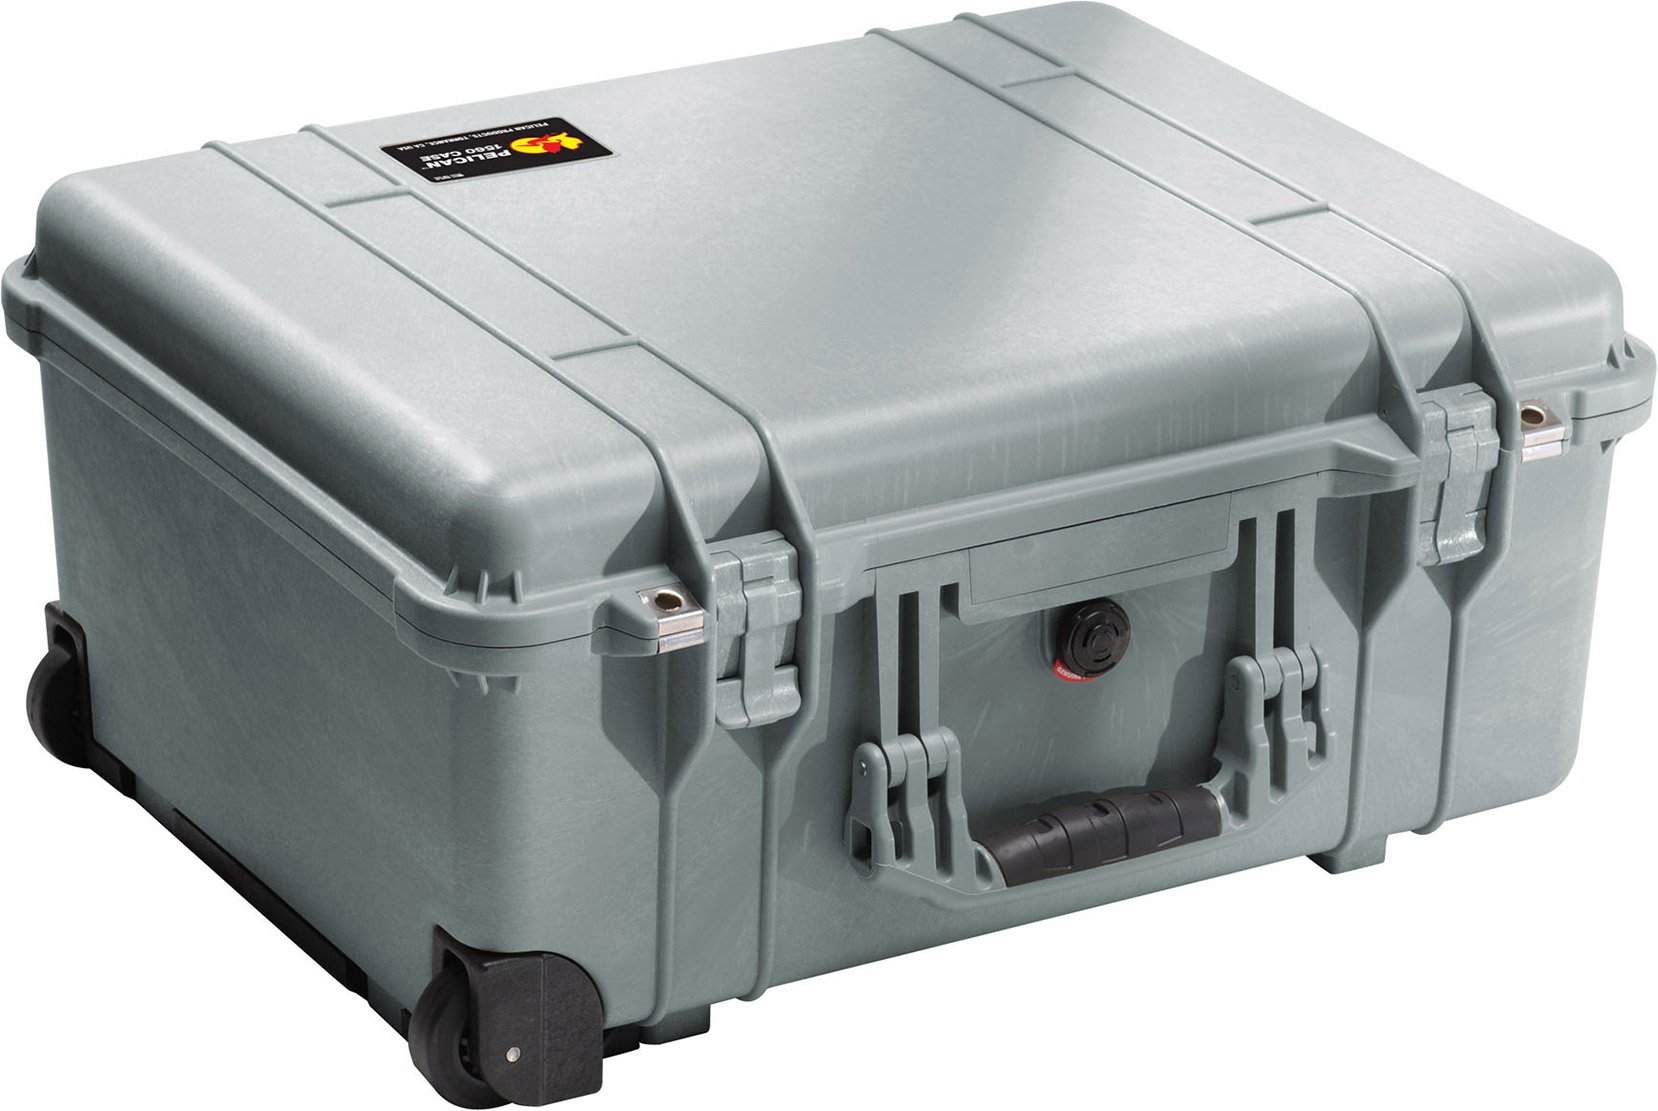 Pelican 1560 Camera Case With Foam (Silver)